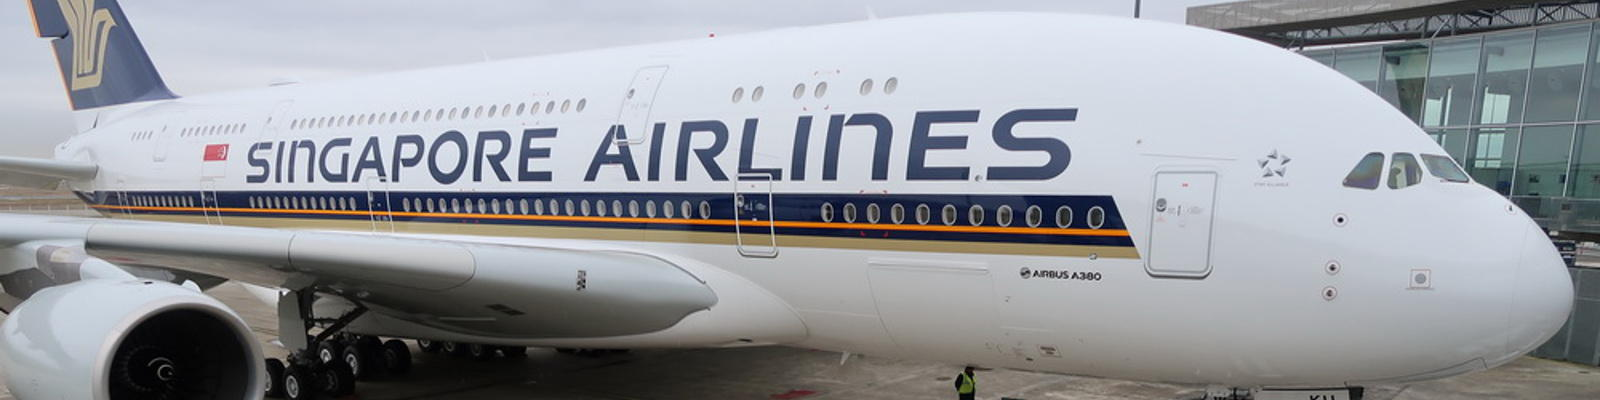 Premium Economy Vs Business Class On Singapore Airlines\' New ...